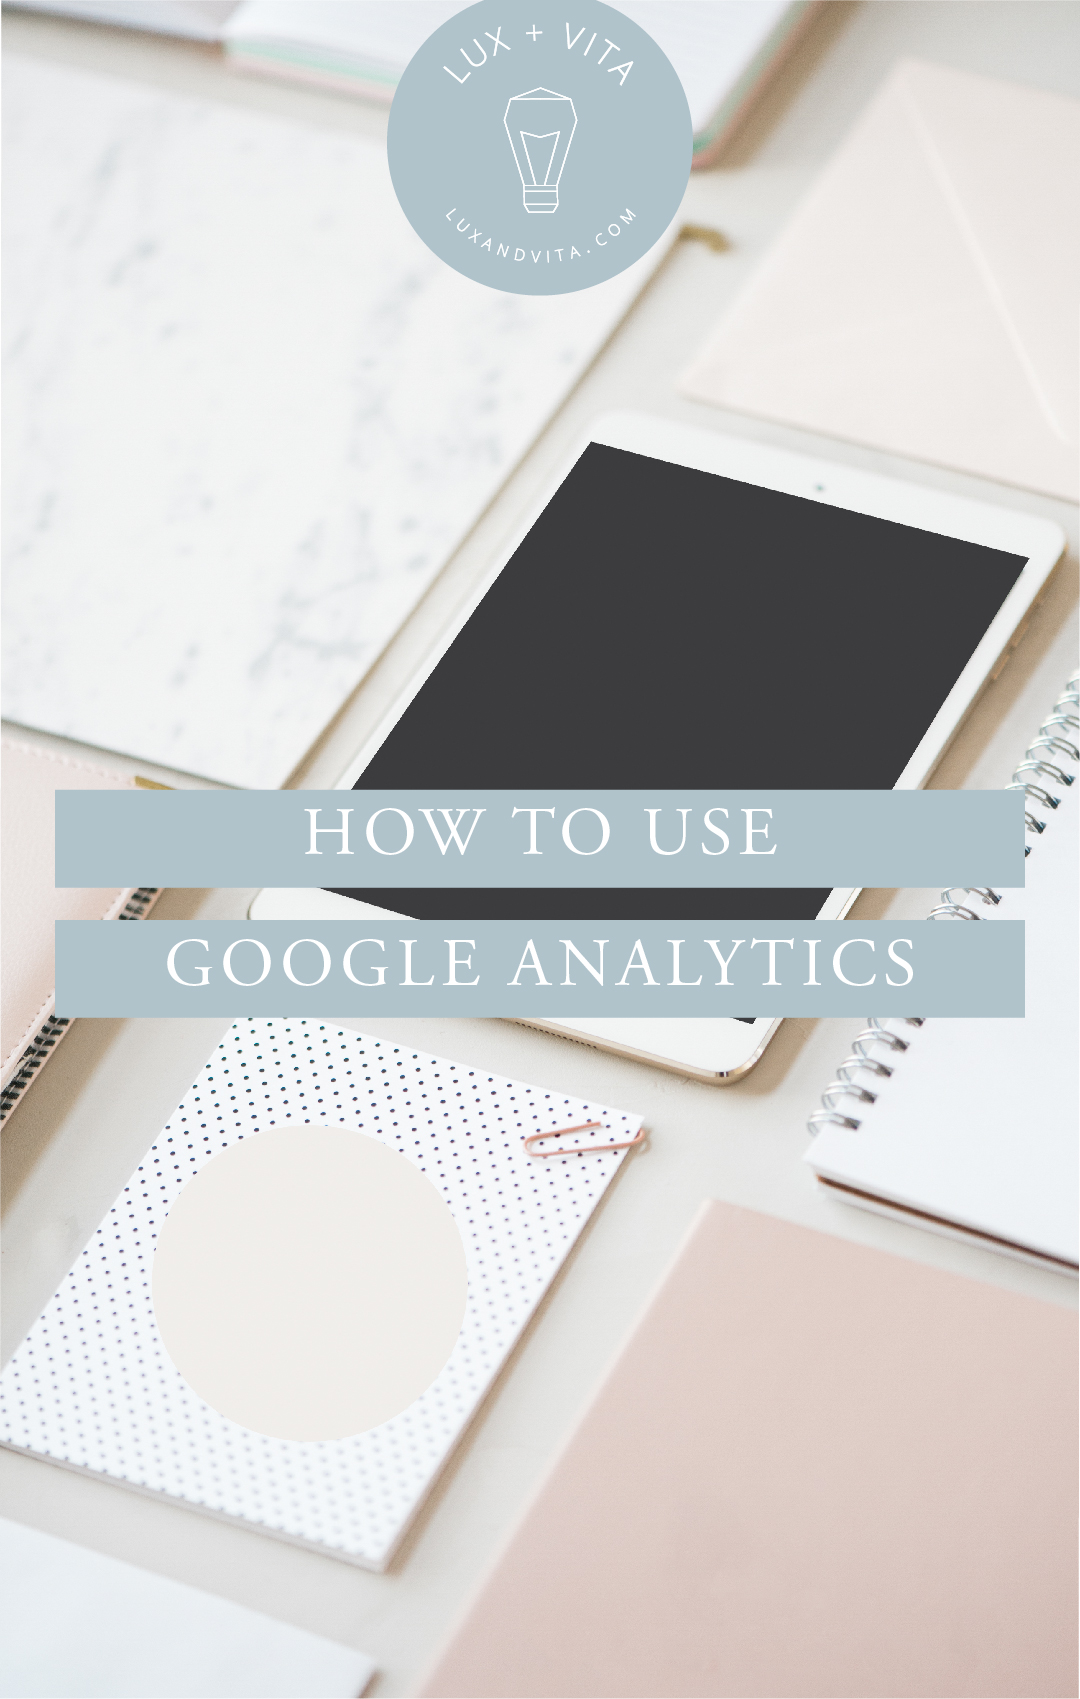 Blog-How-to-use-Google-Analytics_Pinterest-Tall.jpg